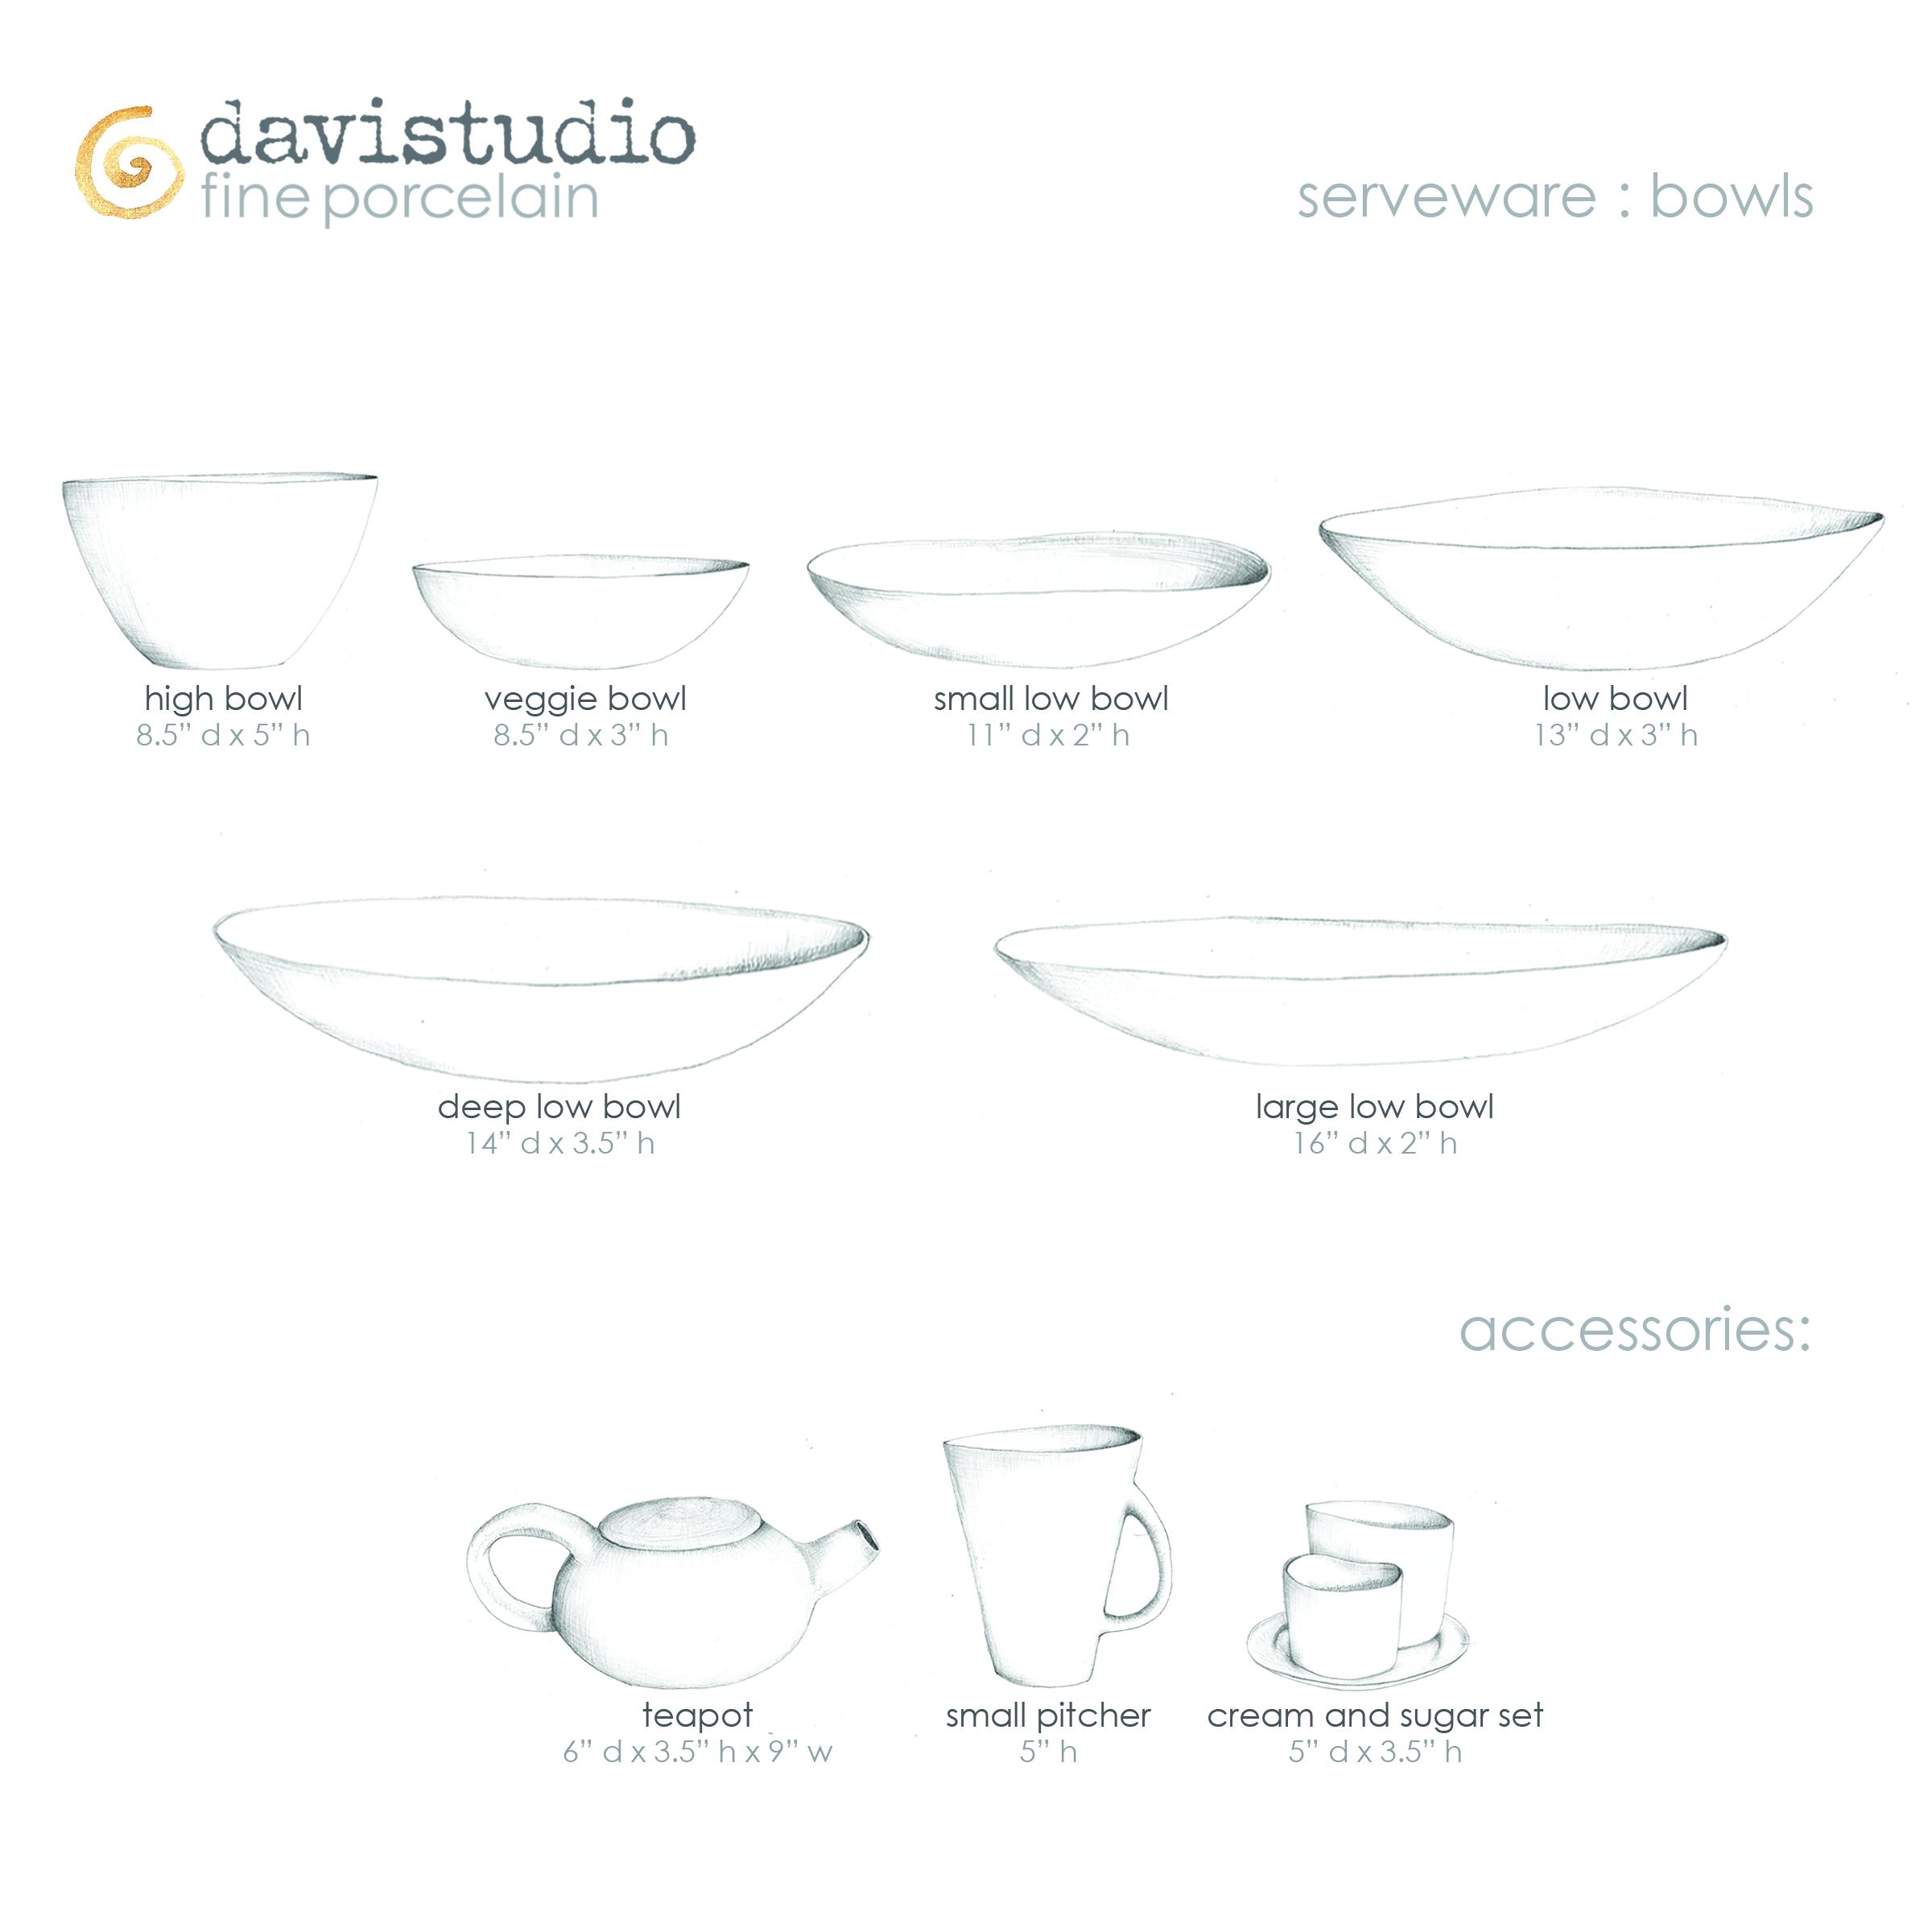 serveware_bowls.jpg